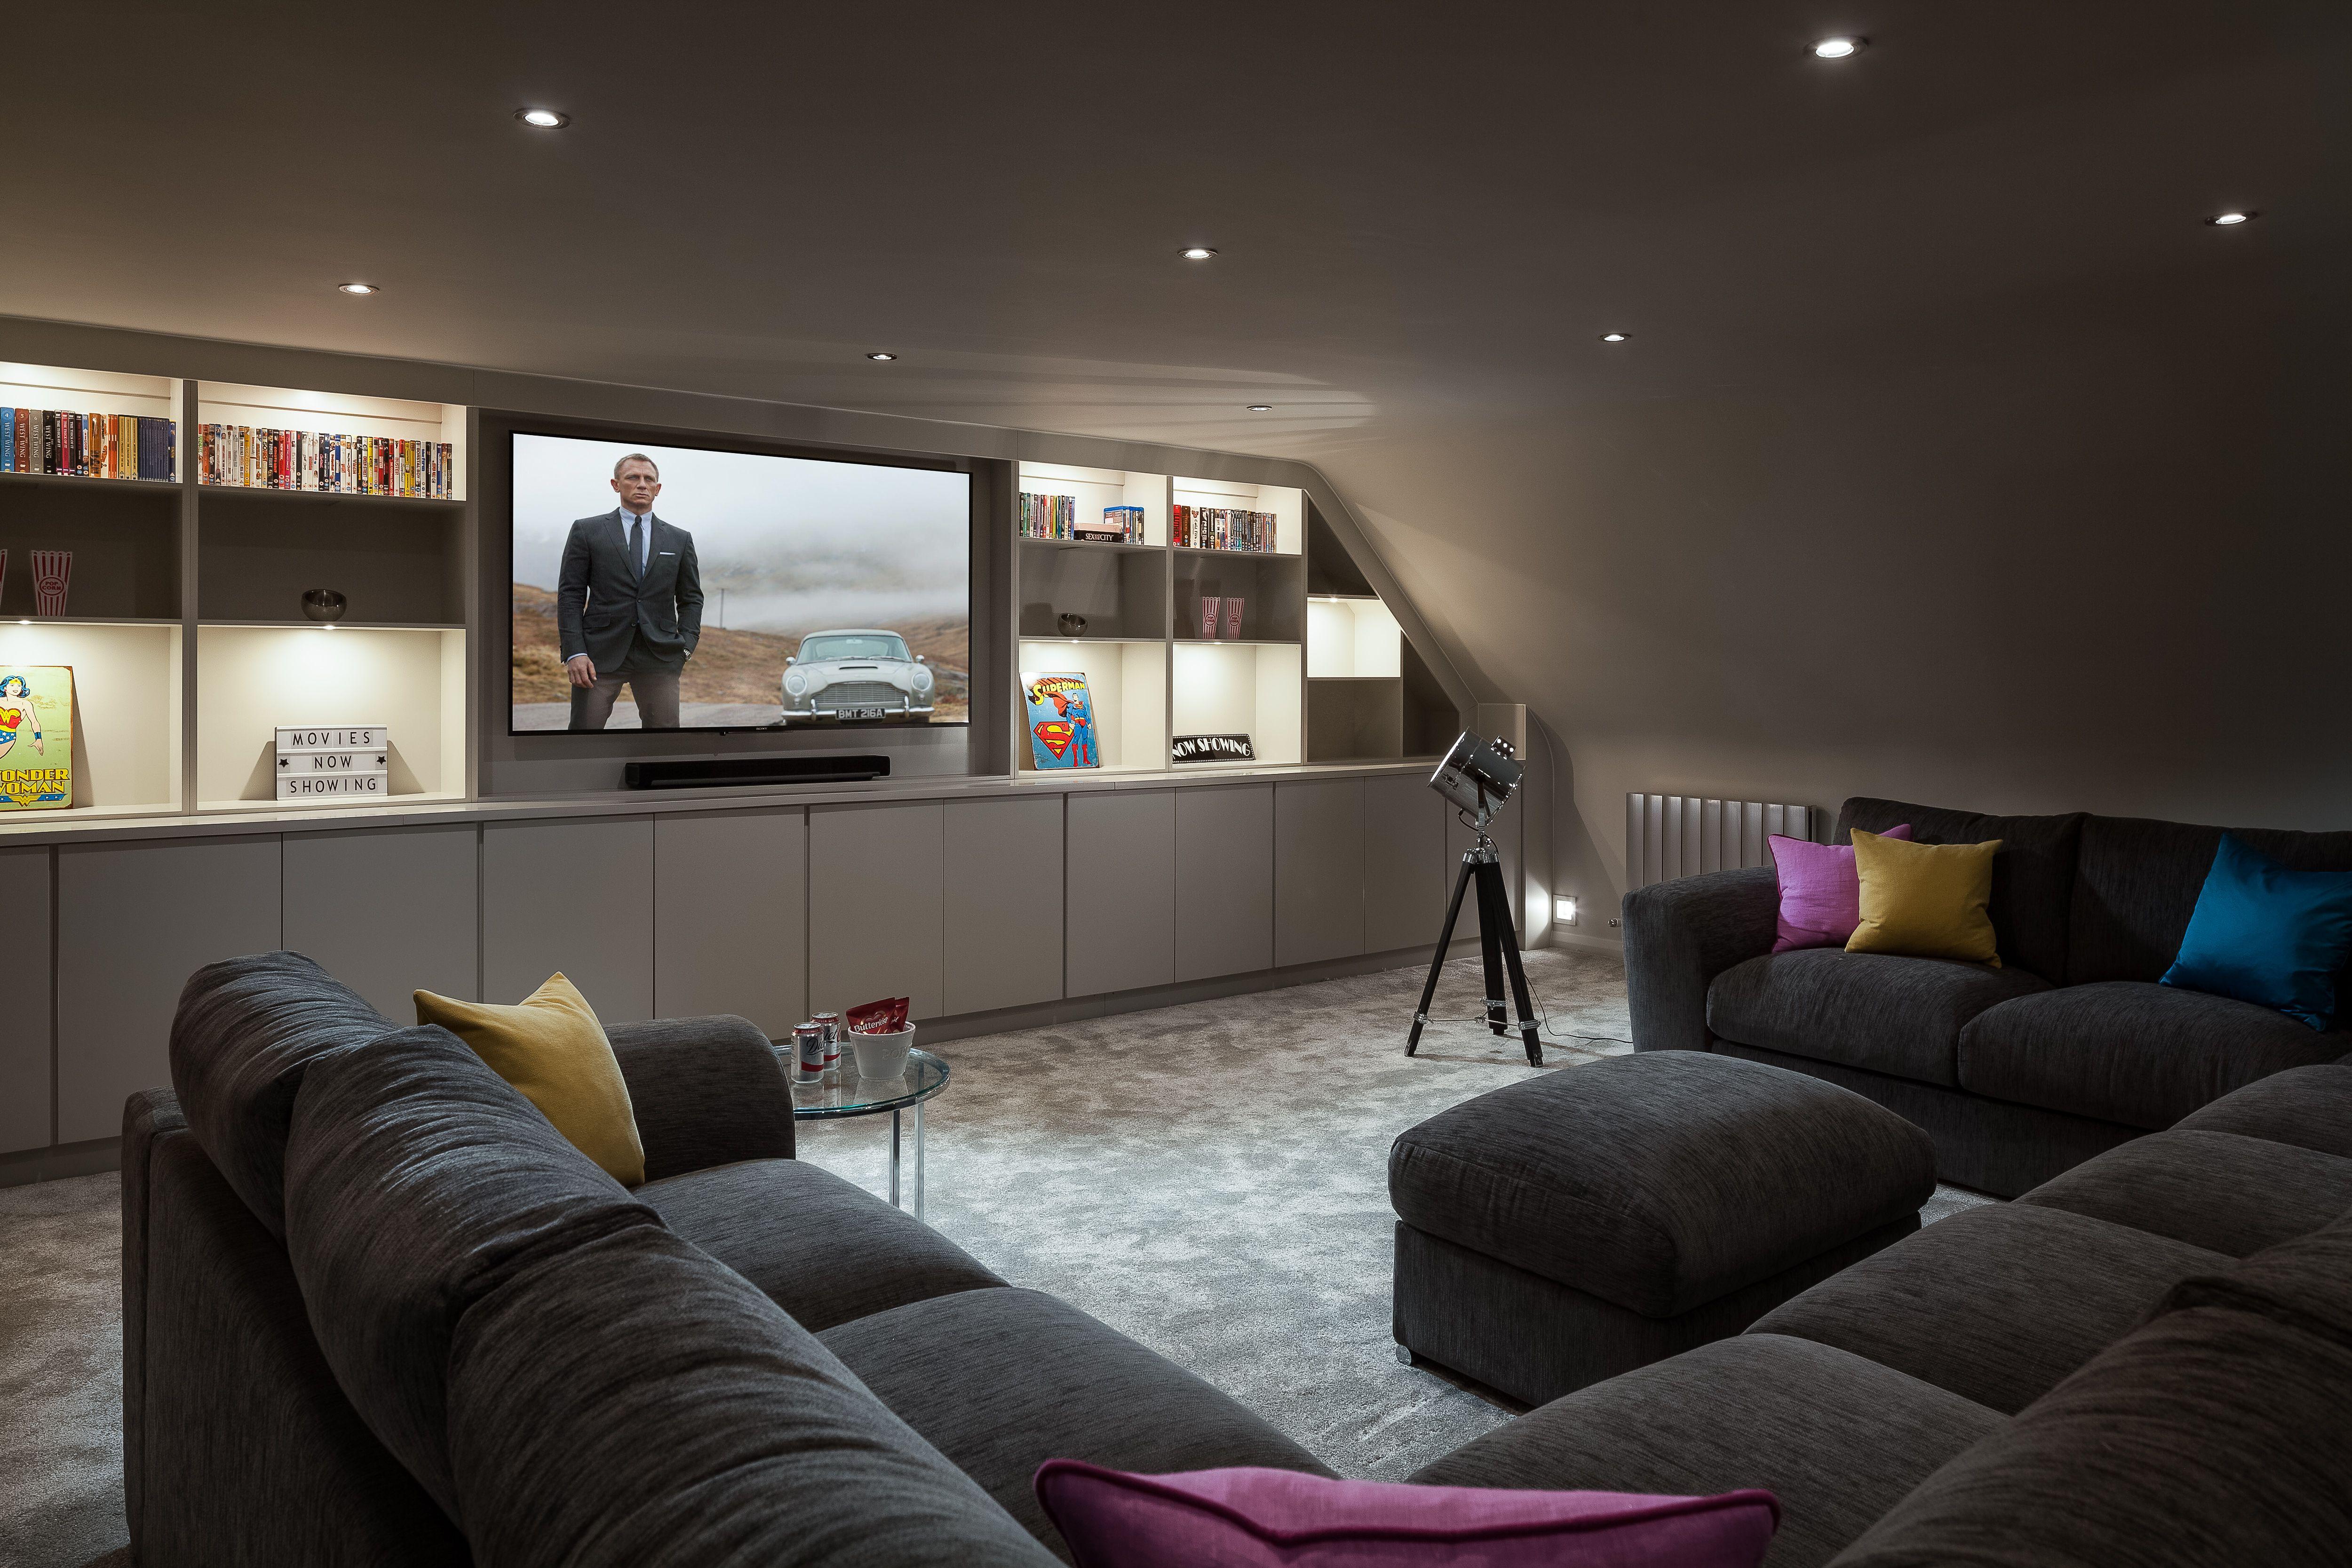 Home Cinema Room With U Shaped Sofa Created In Loft Room With Eaves Home Cinema Room Loft Room Cinema Room